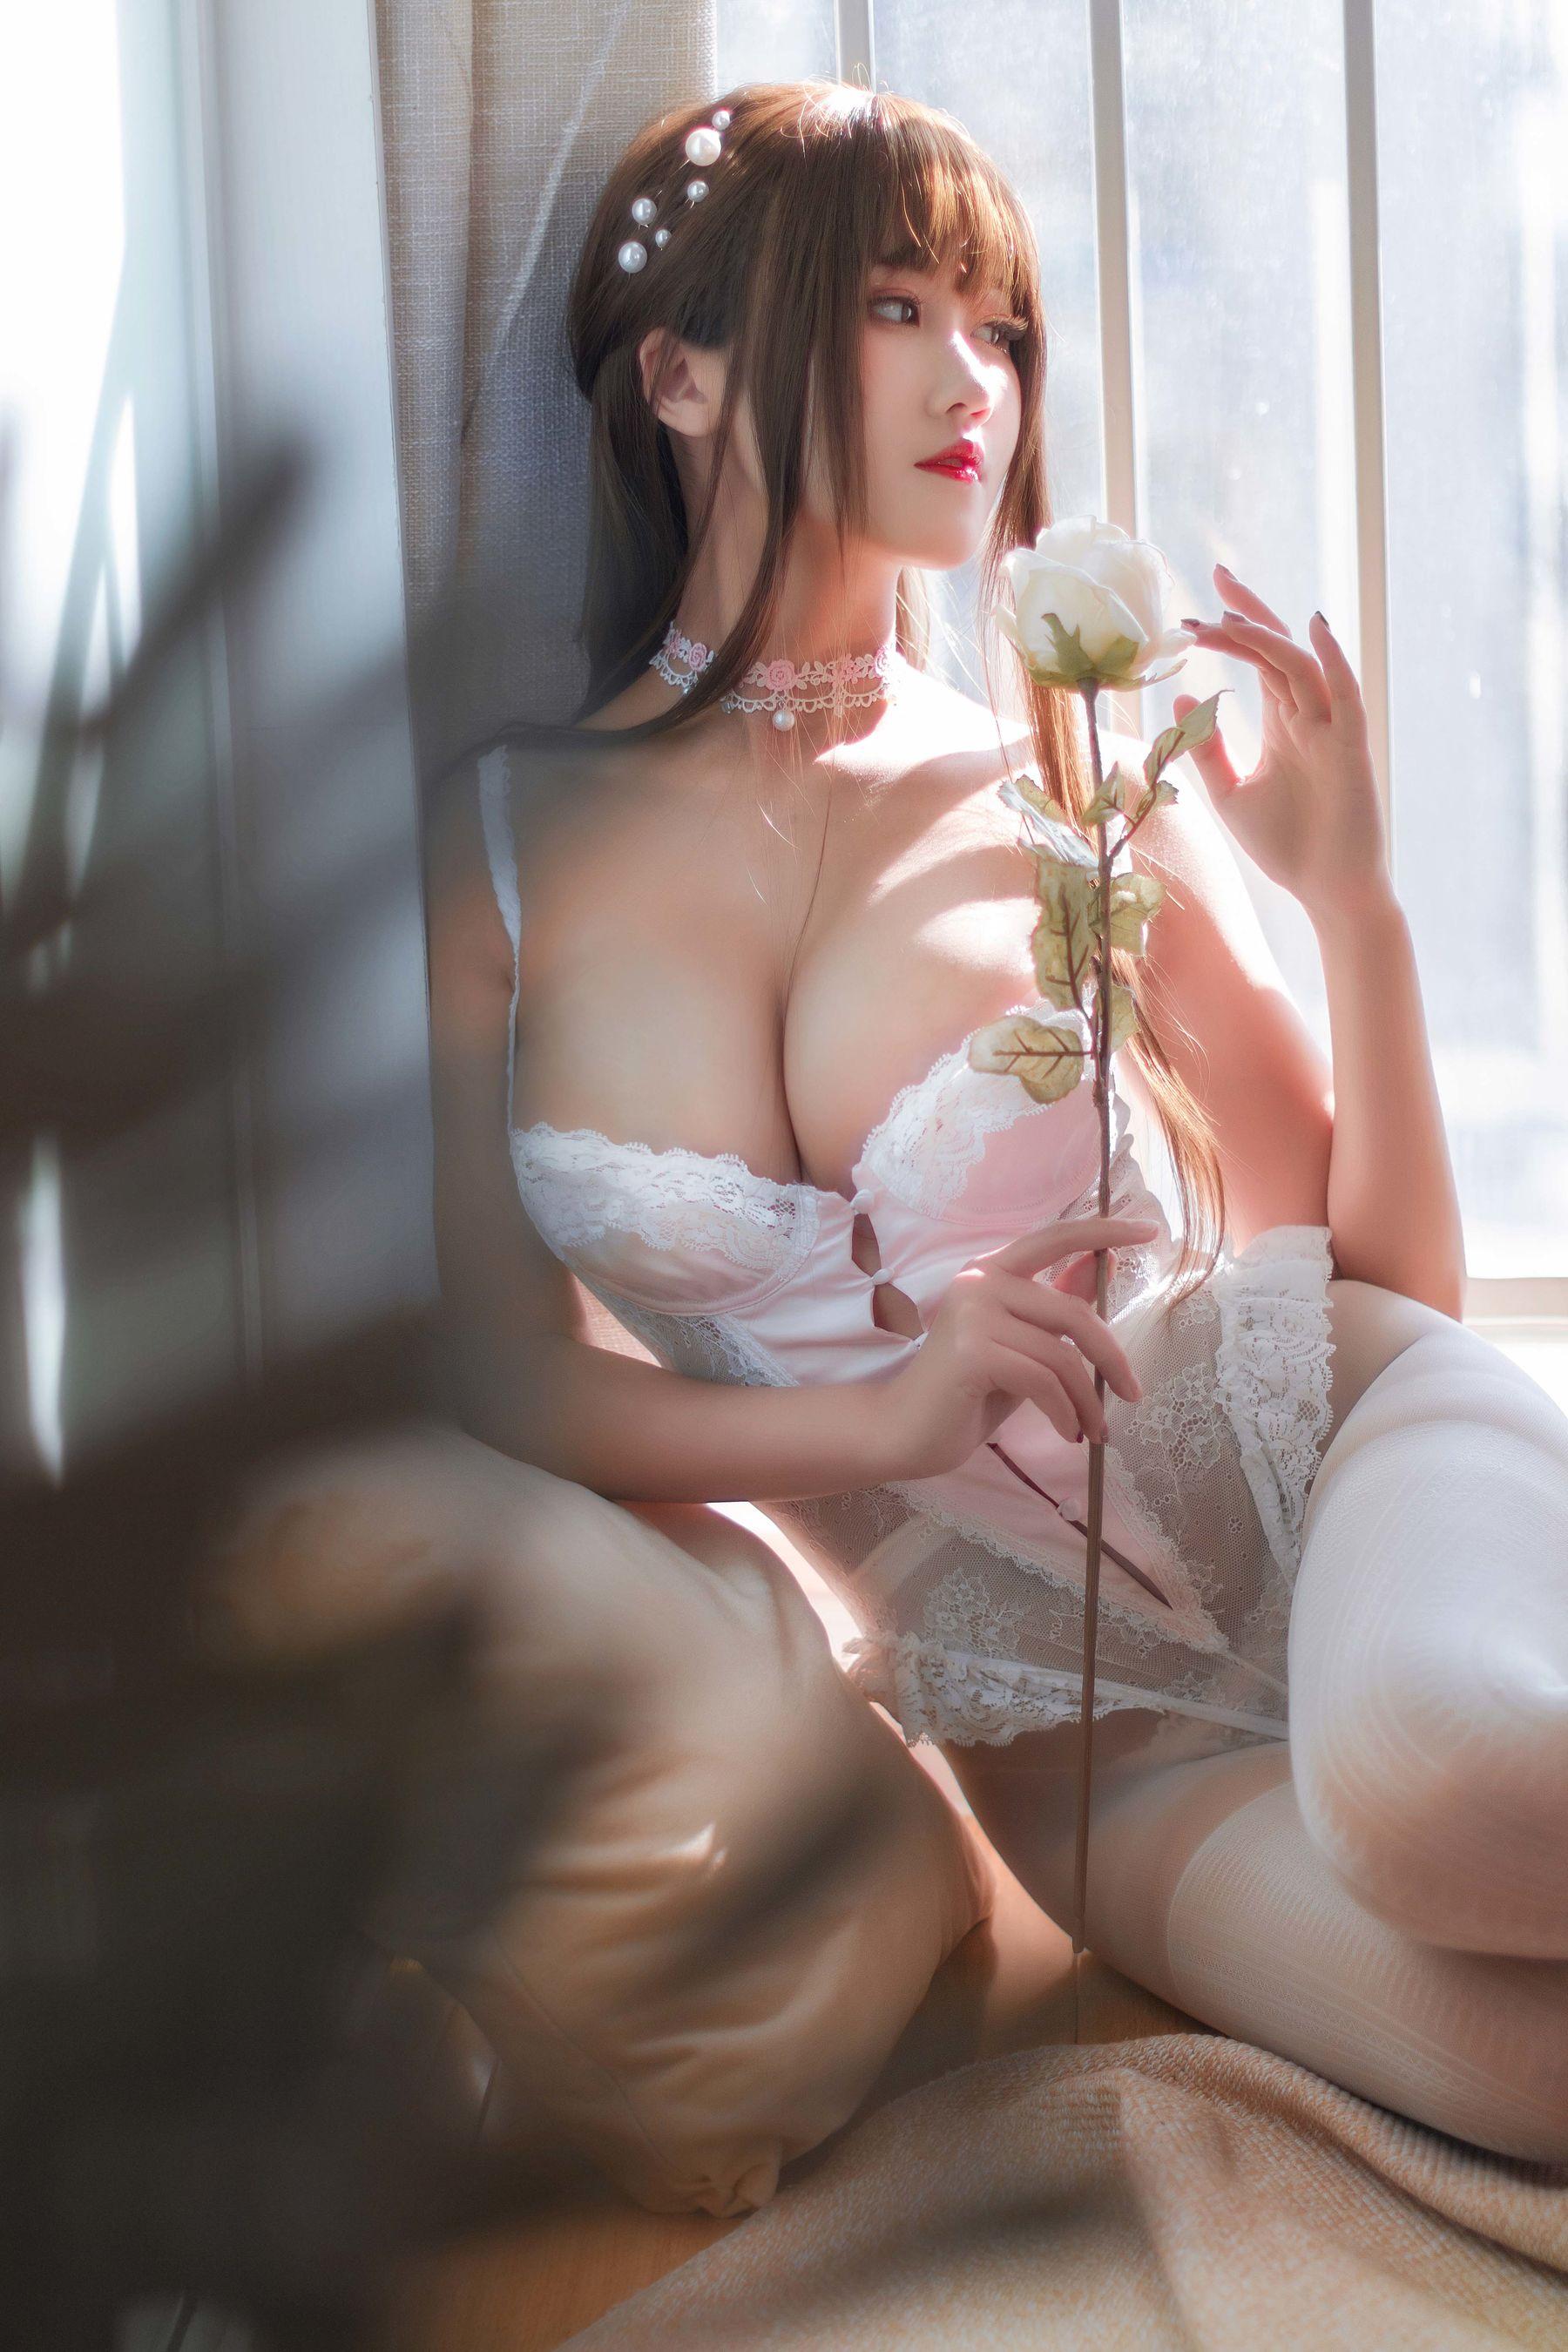 VOL.1062 [网络美女]大胸蕾丝诱惑:三度_69(Coser三度_69)超高清写真套图(20P)